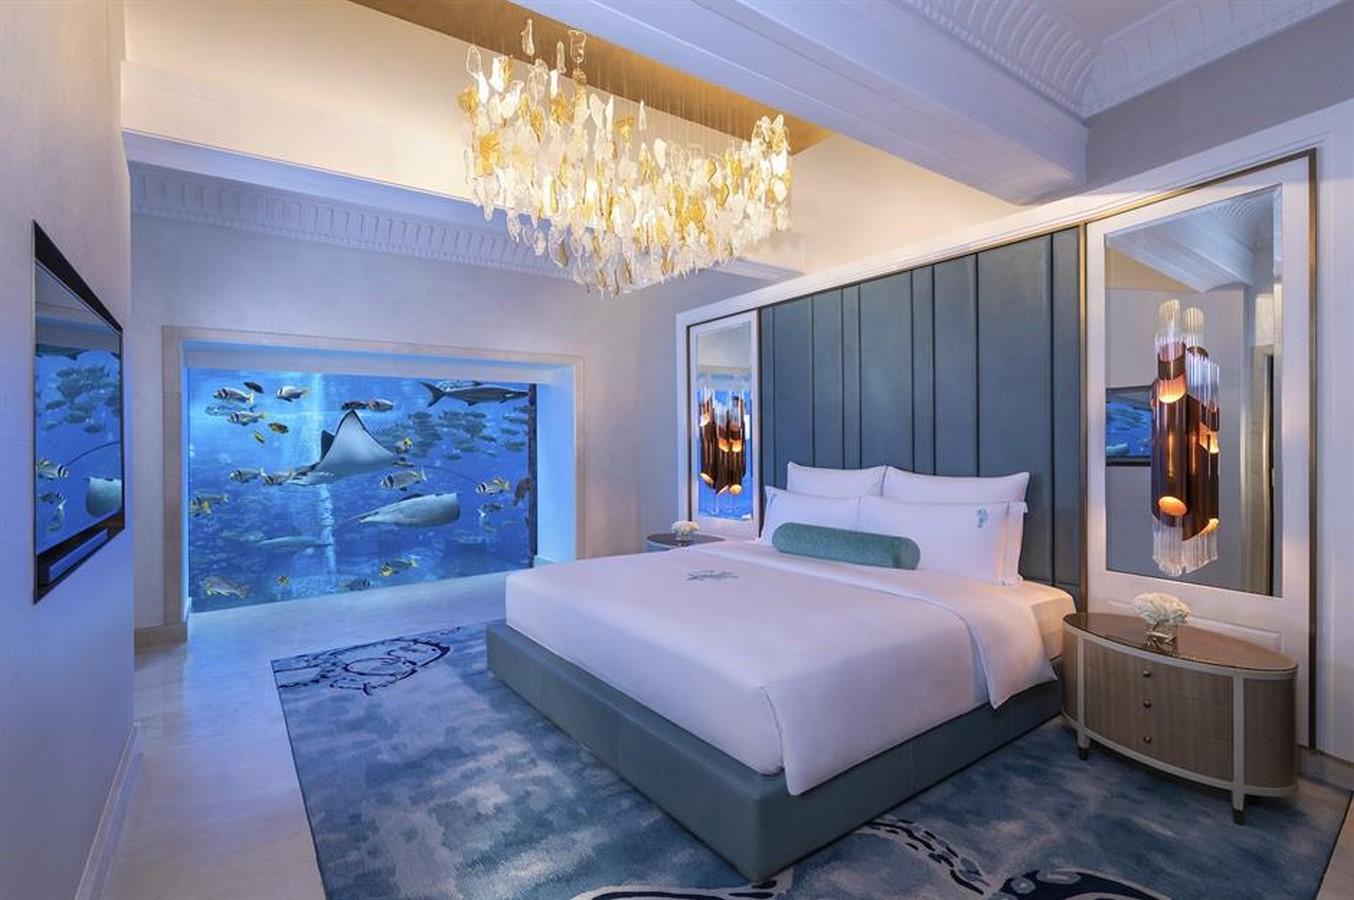 20 Futuristic bedroom interior ideas - Sheet6